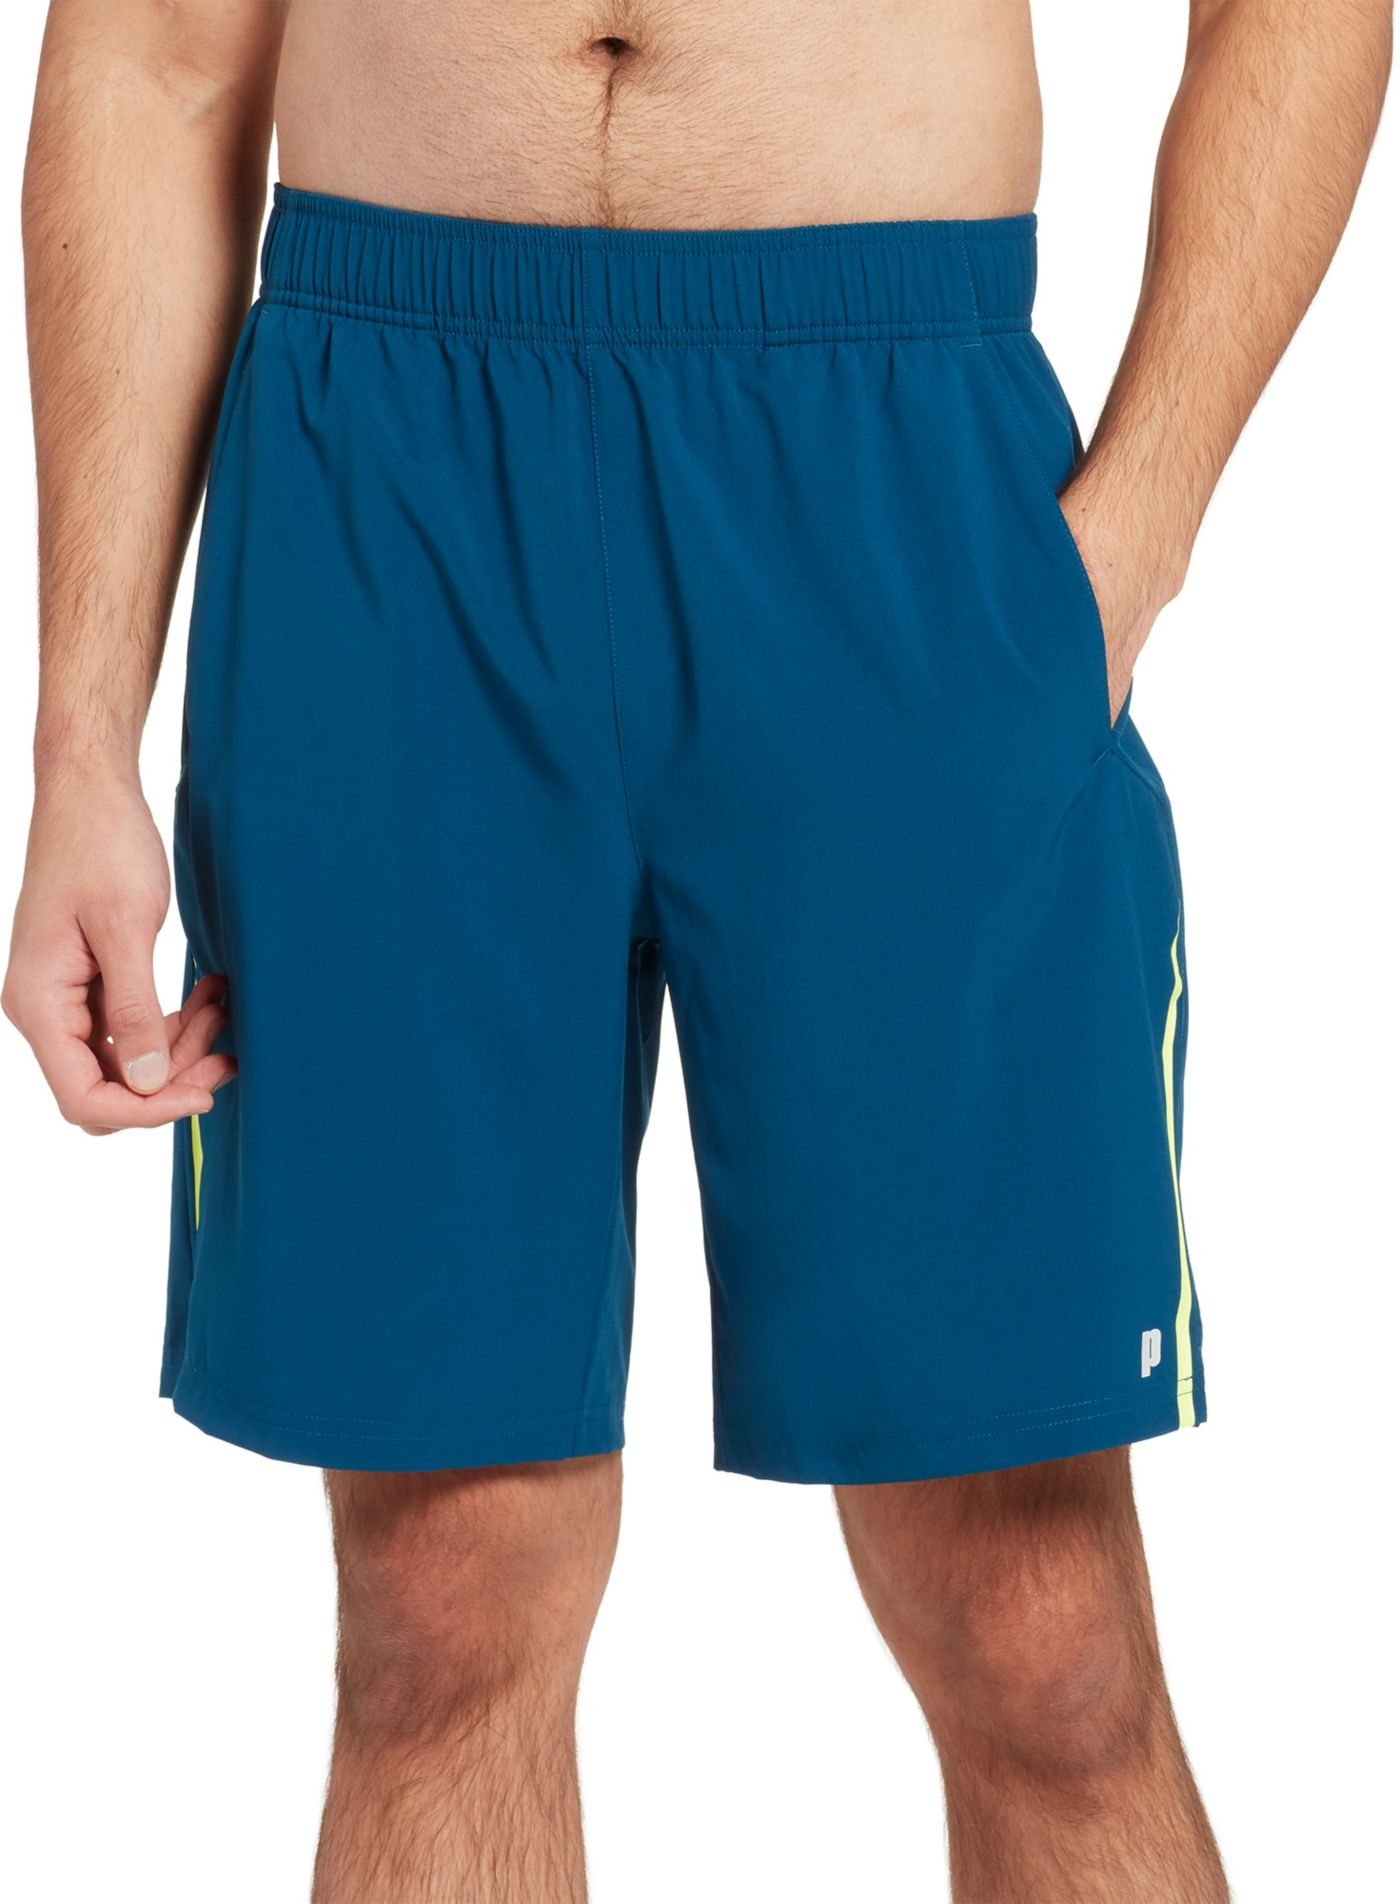 Prince Men's Bonded Woven Tennis Shorts